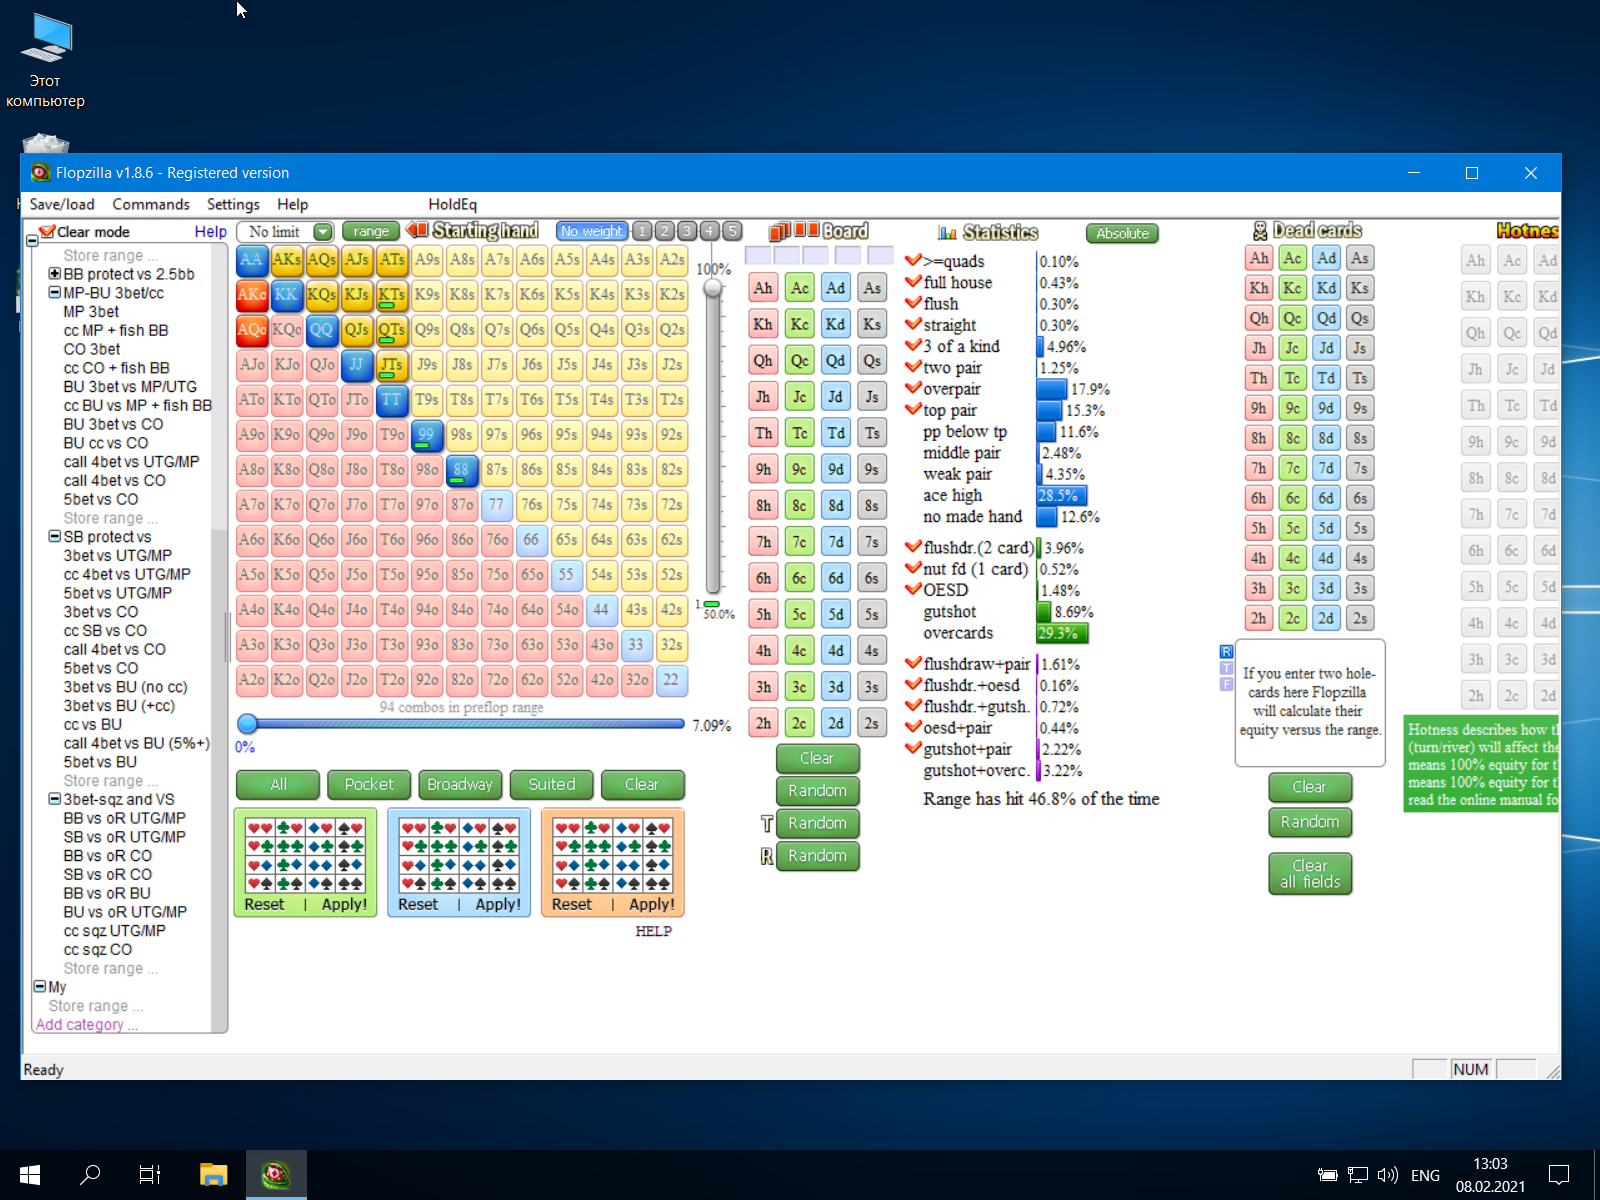 virtualboxwin-10080220211303321612778630.png